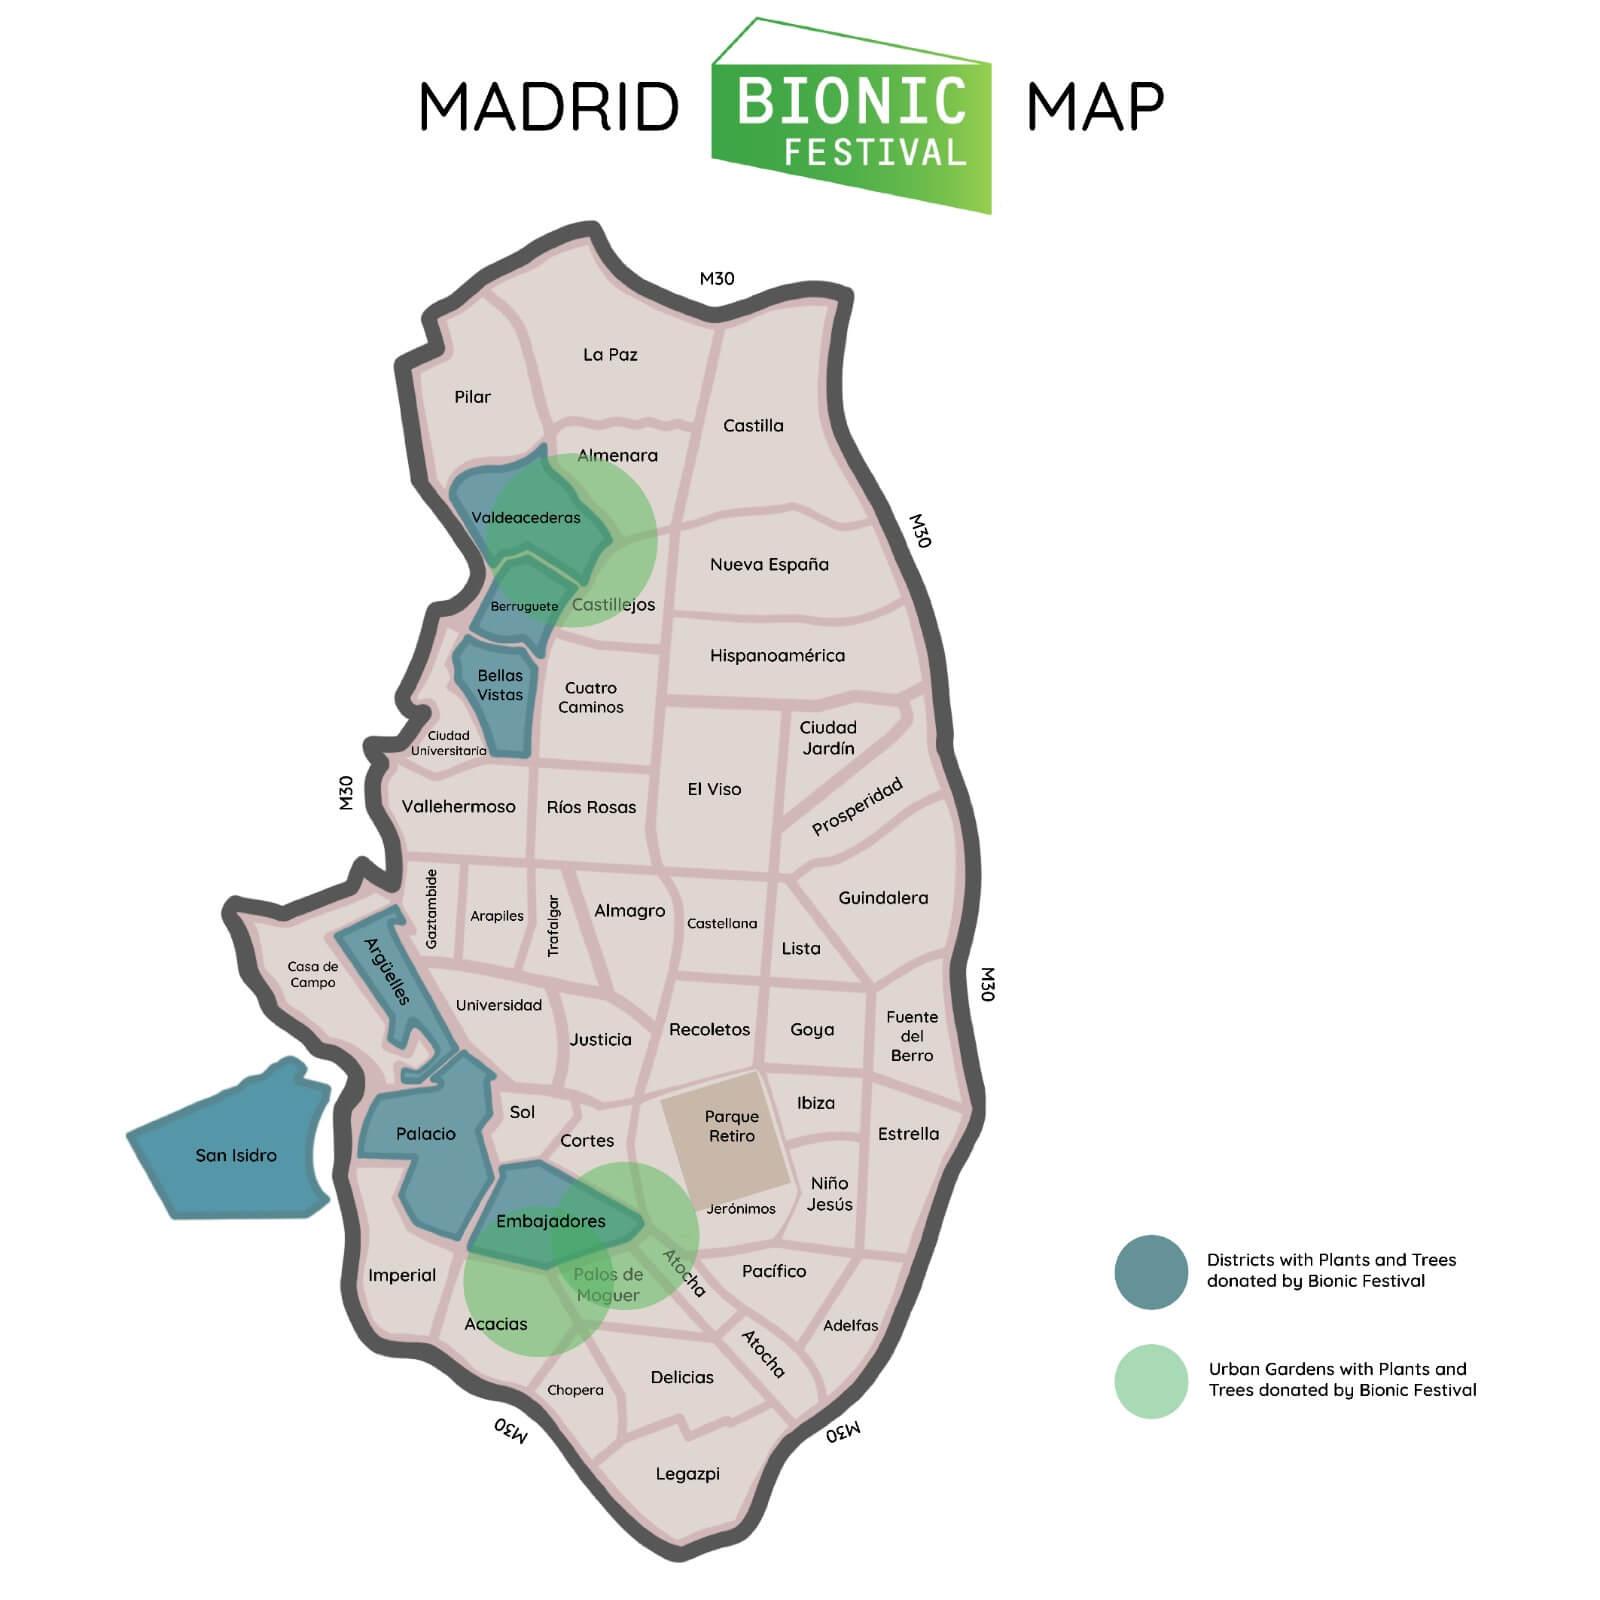 Madrid Bionic Festival Map 2021 Min